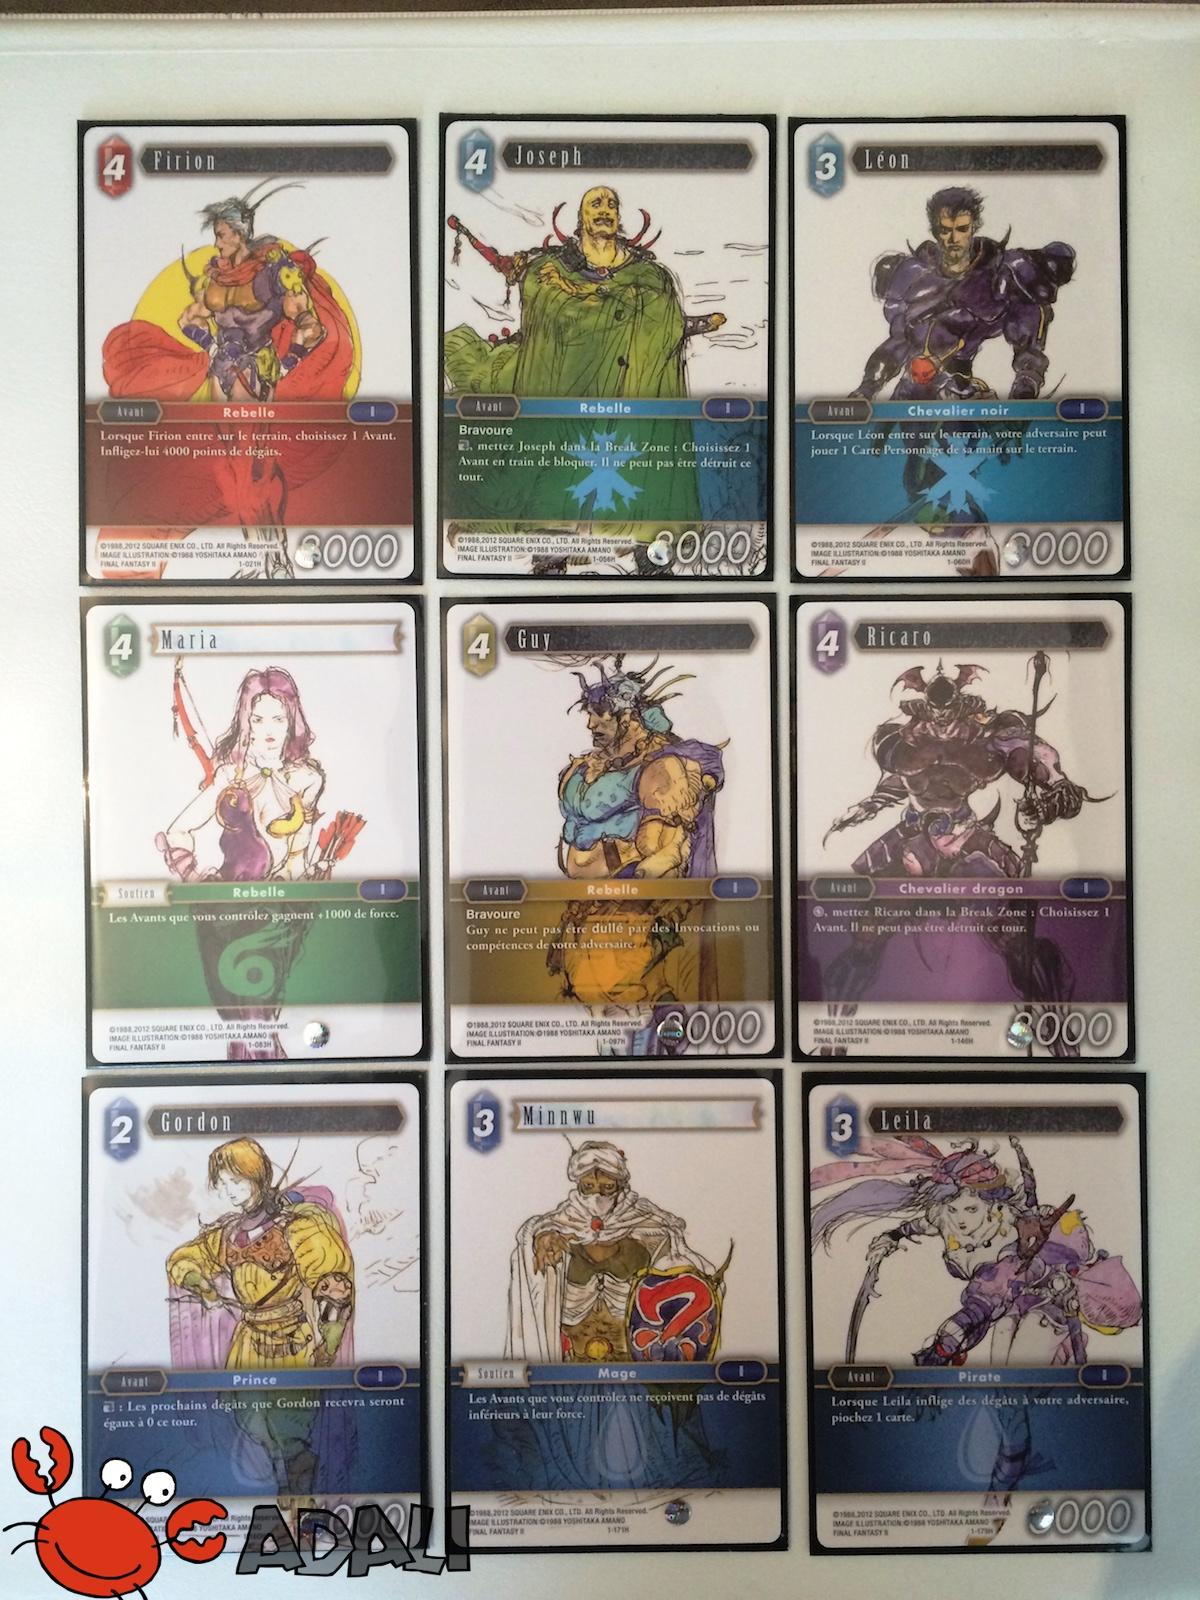 Cartes illustrées par Yoshitaka Amano